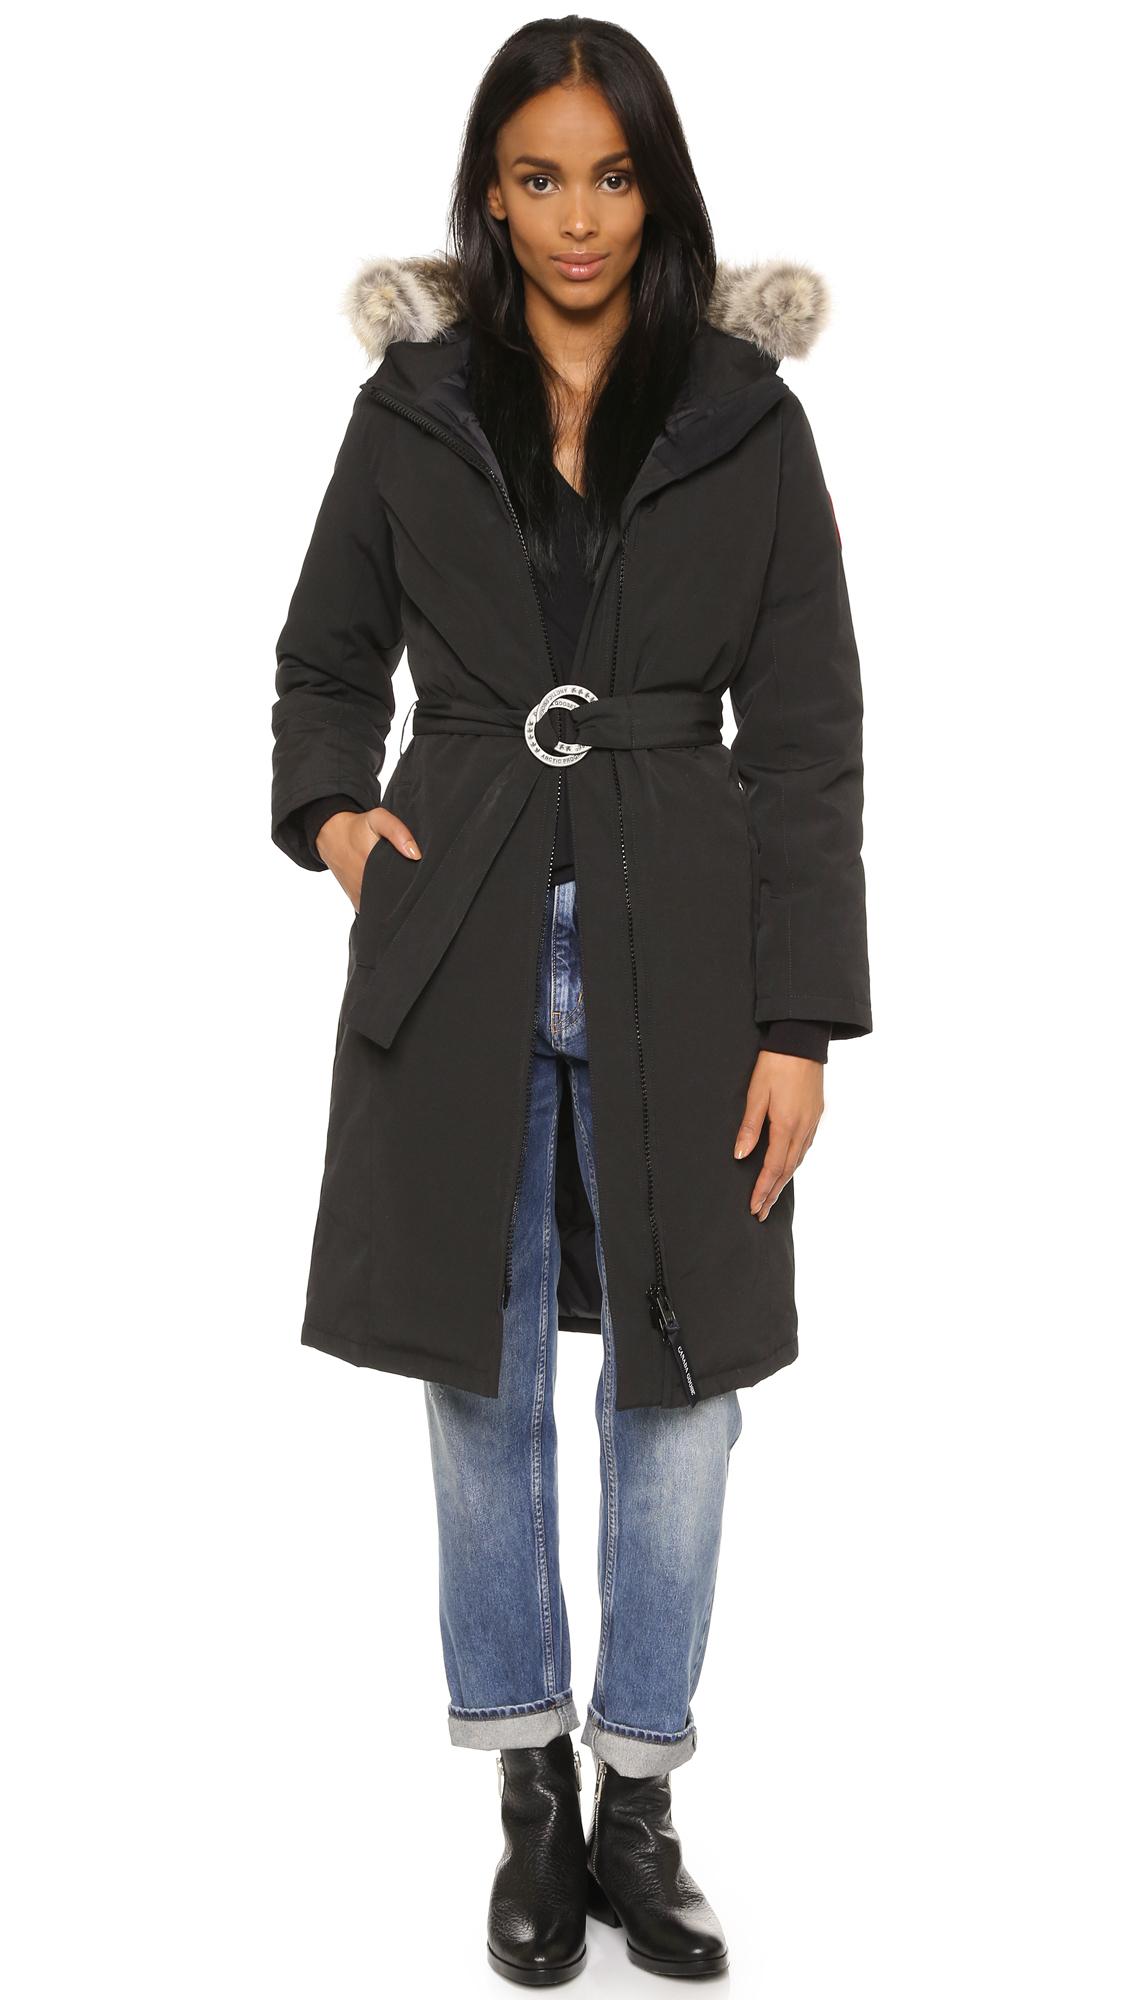 Goose Island Women S Clothing